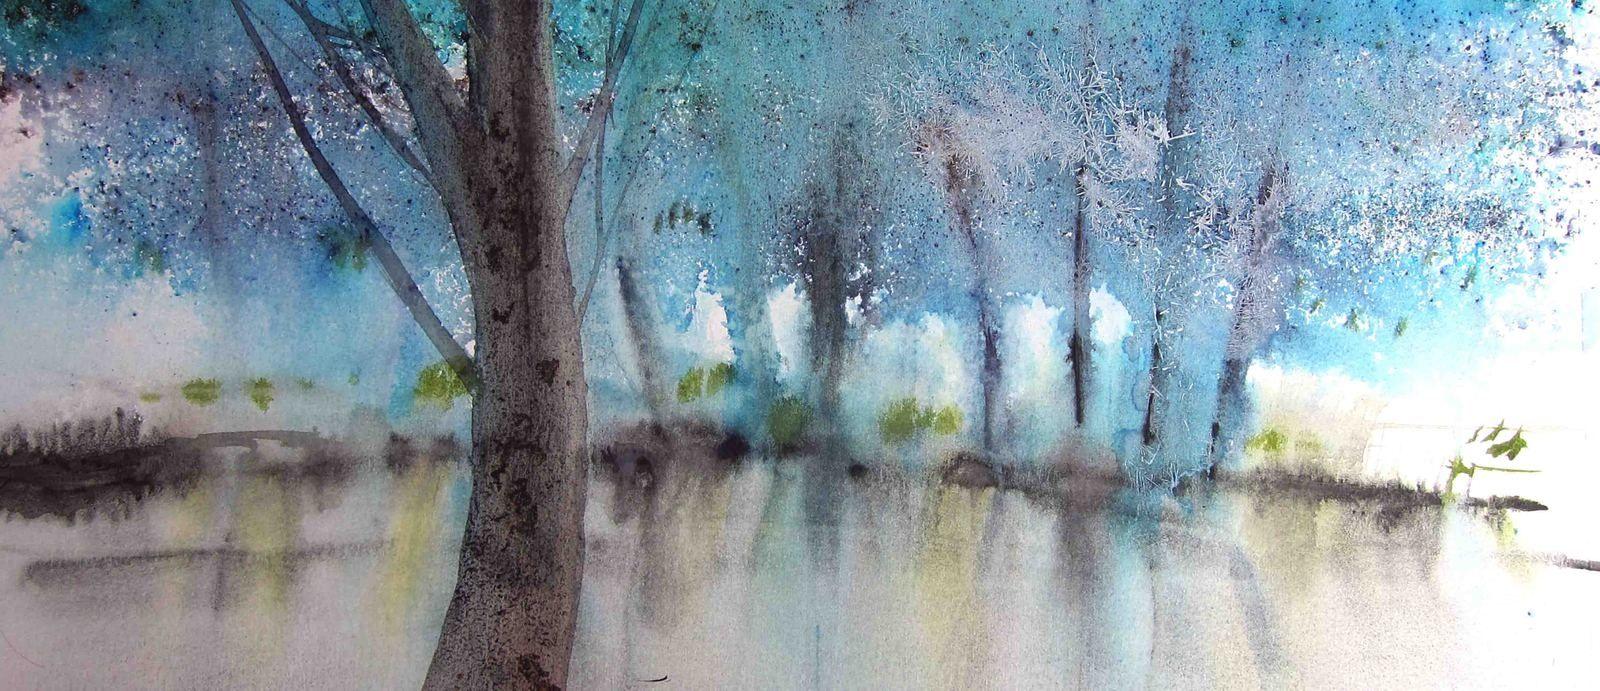 Картинки по запросу reine marie pinchon aquarelles